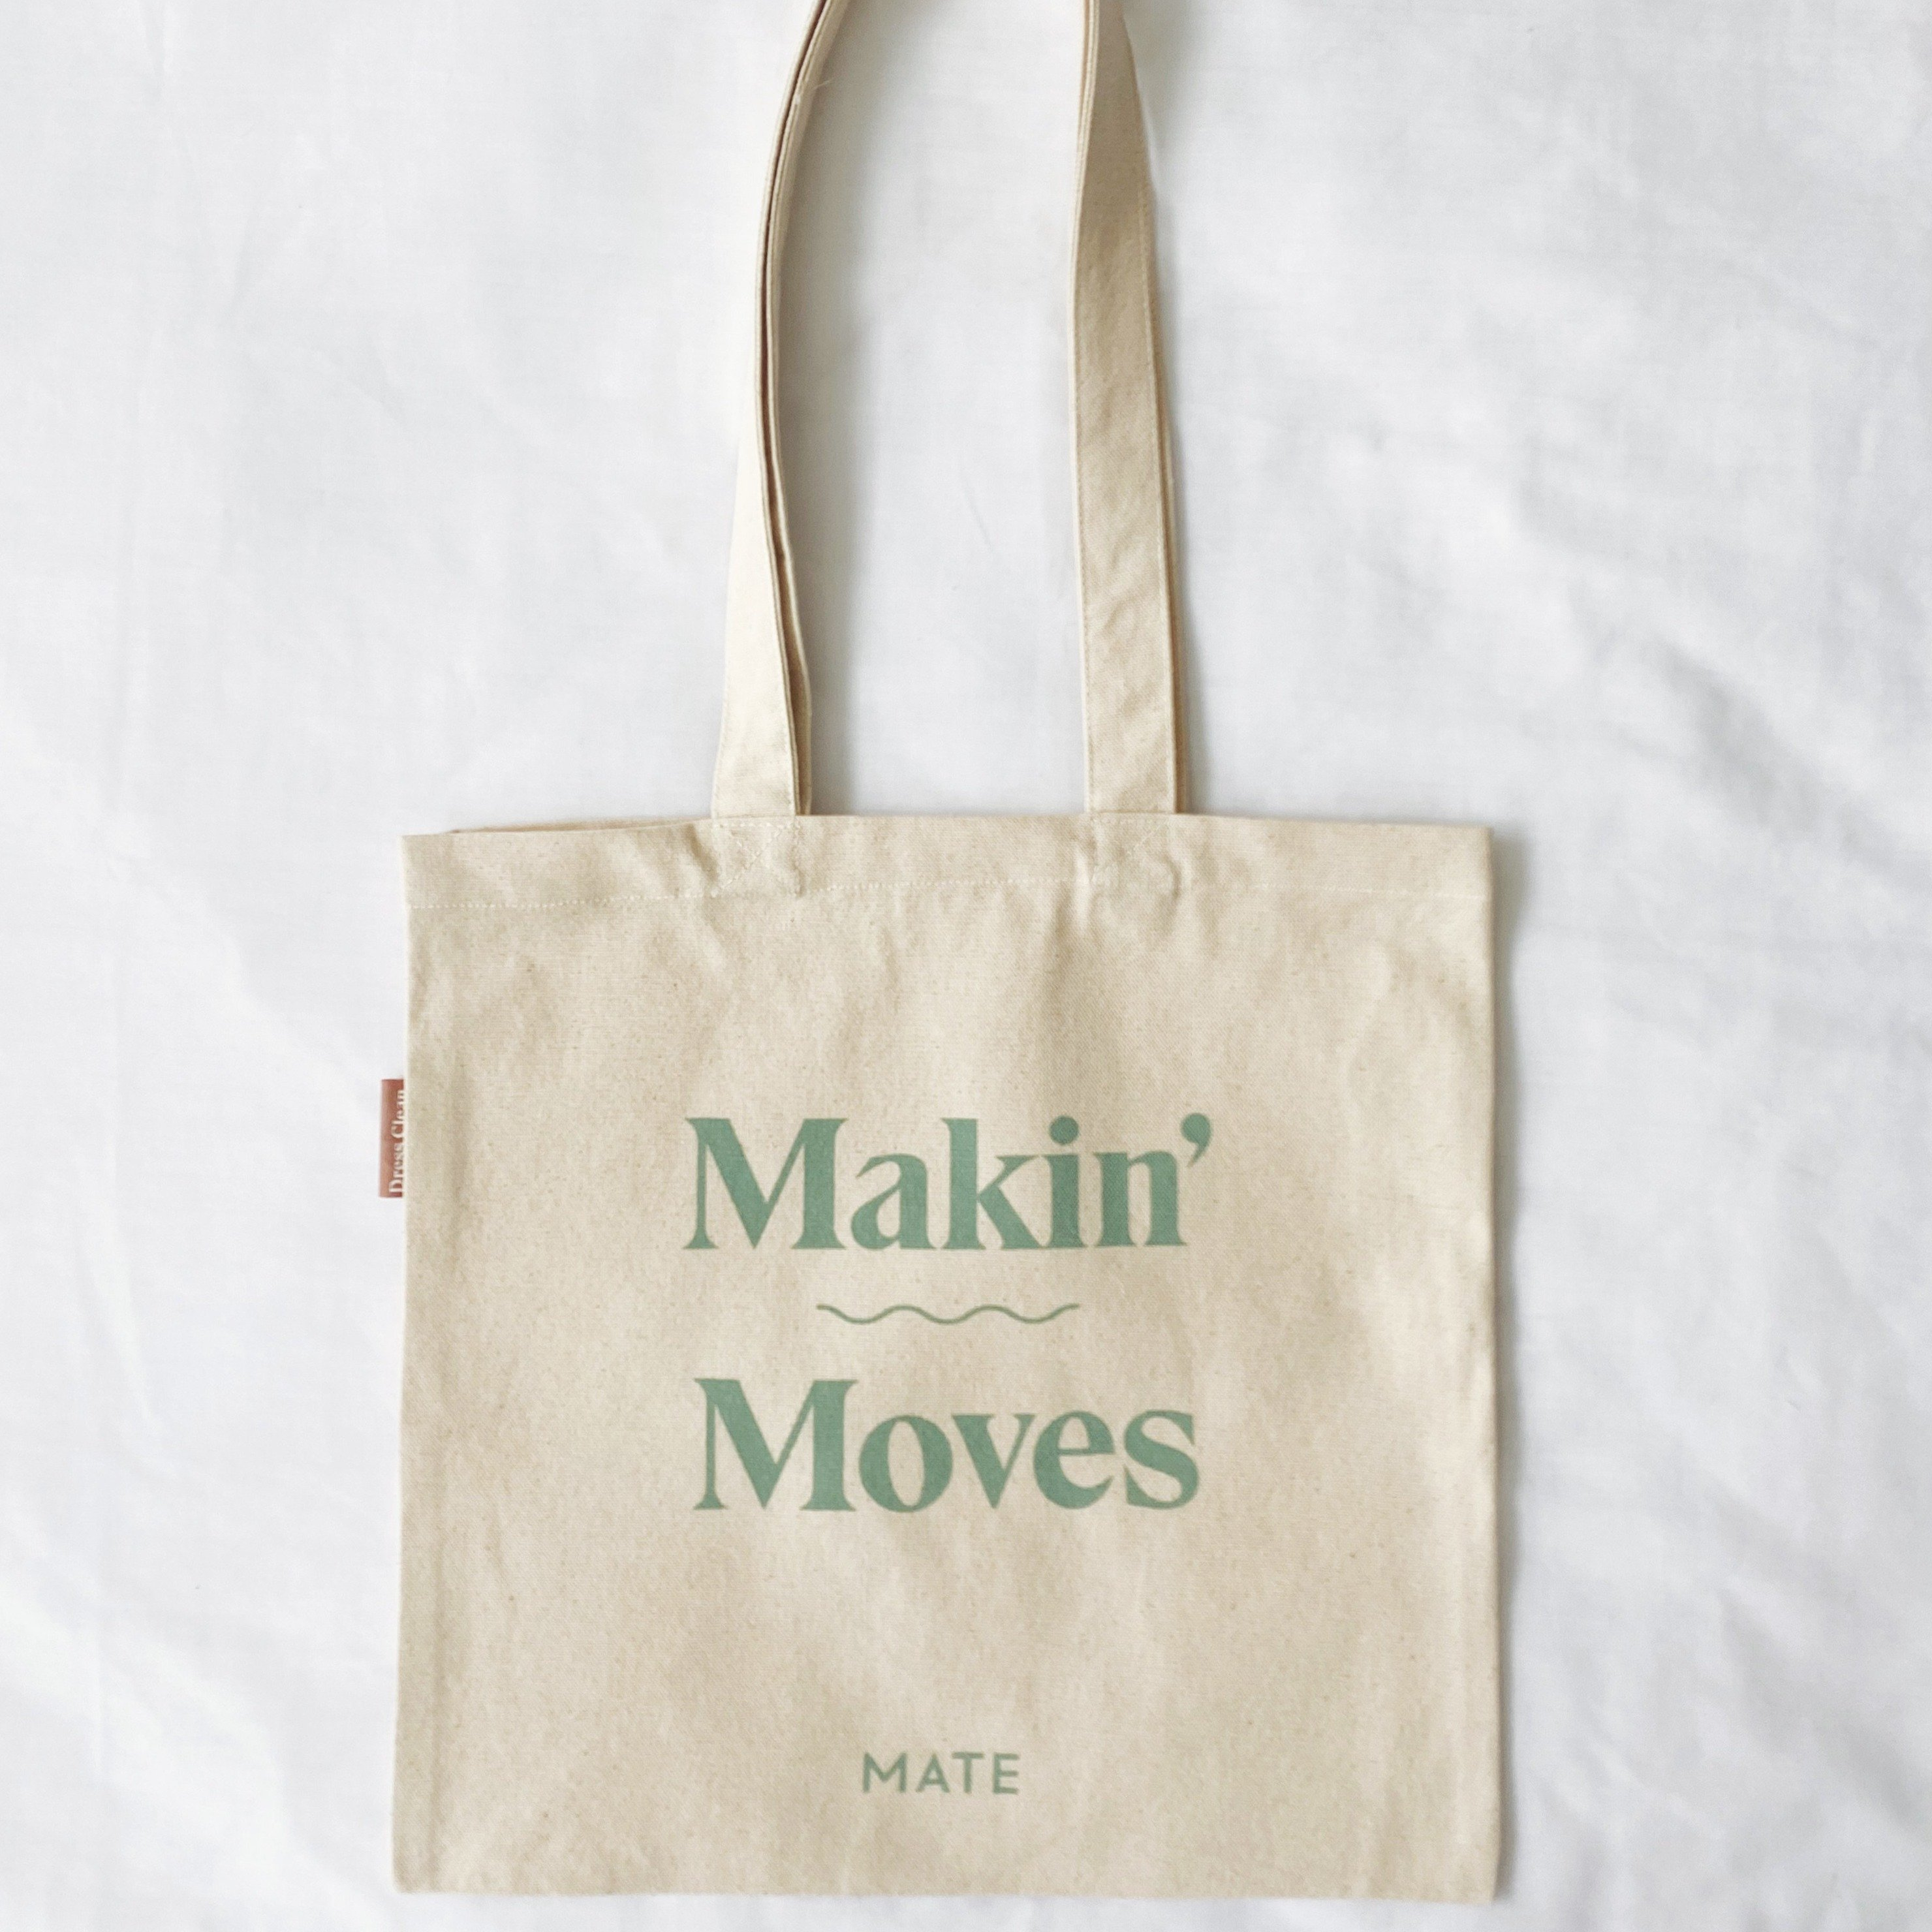 Makin' Moves Tote